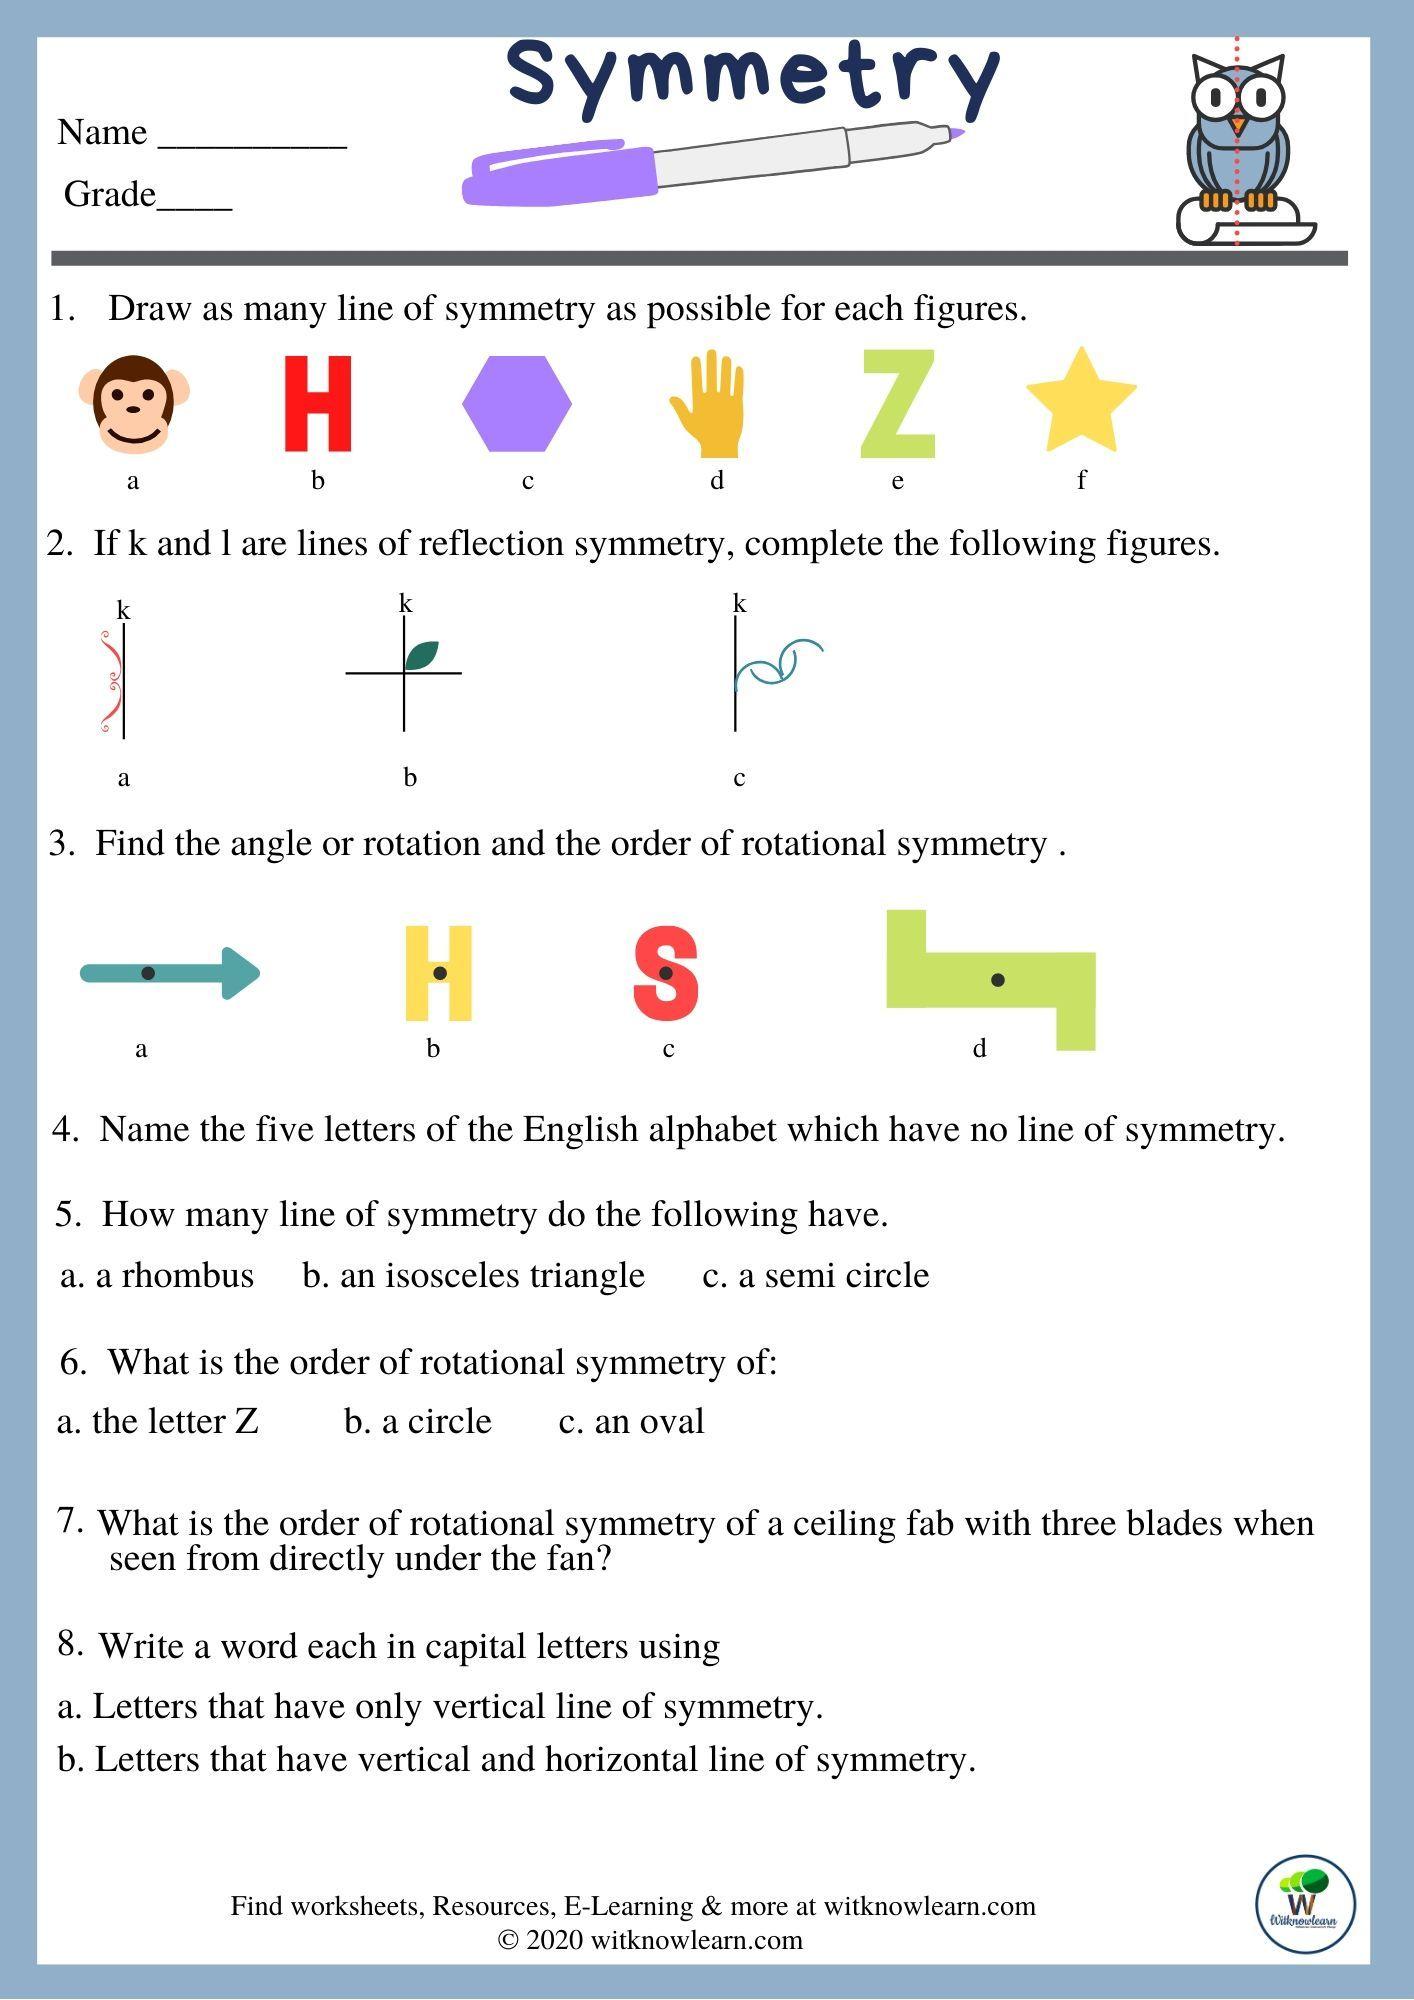 medium resolution of symmetry worksheets for kids   Symmetry worksheets